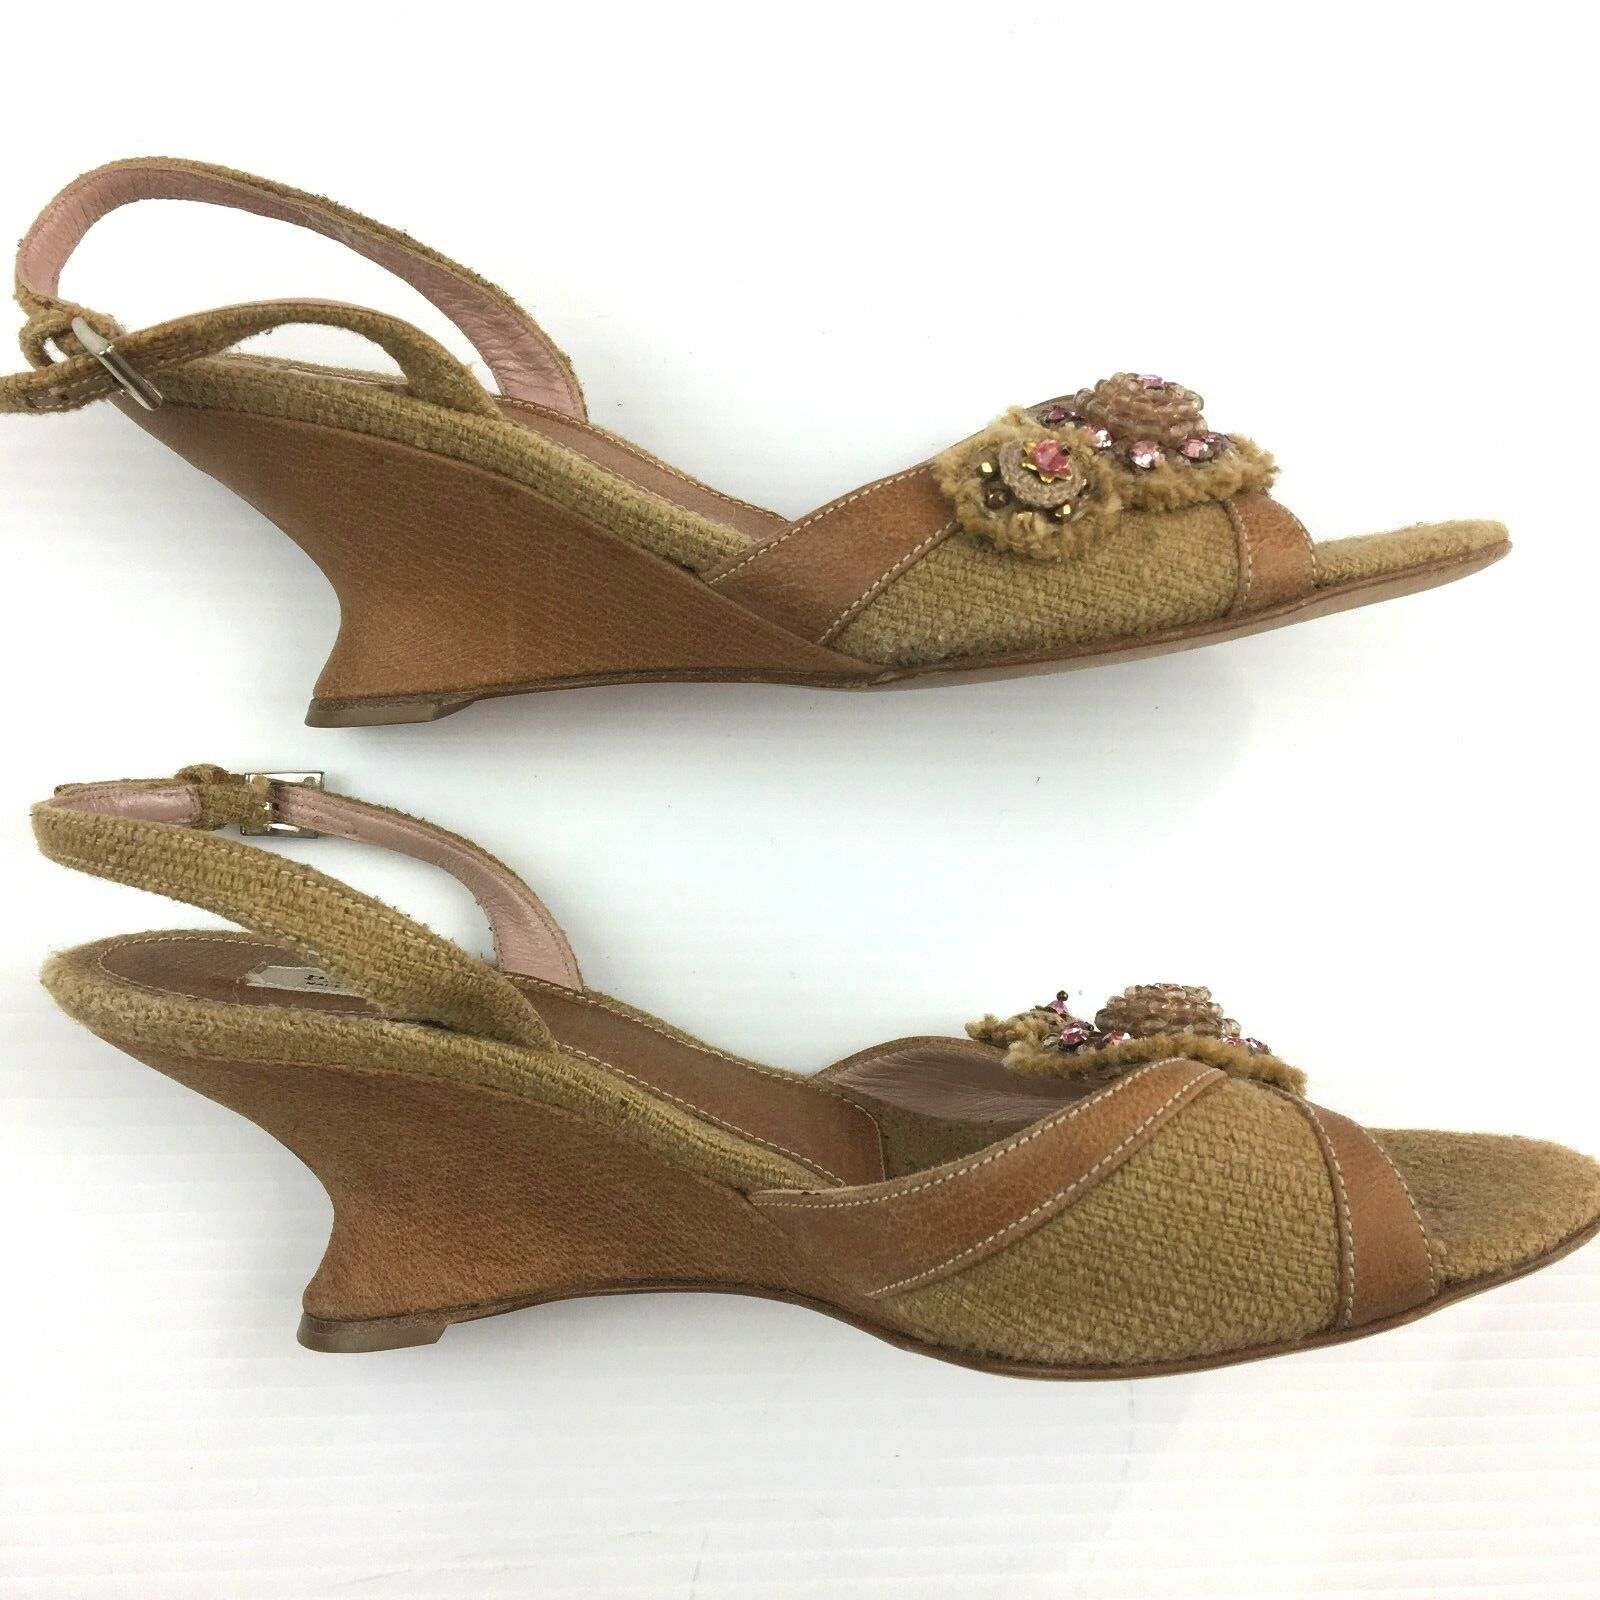 Prada Sandals Beige Canvas Leather Wedge Heel Peep Toes Slingbacks Slingbacks Slingbacks EU37.5 US 7 df0bfe